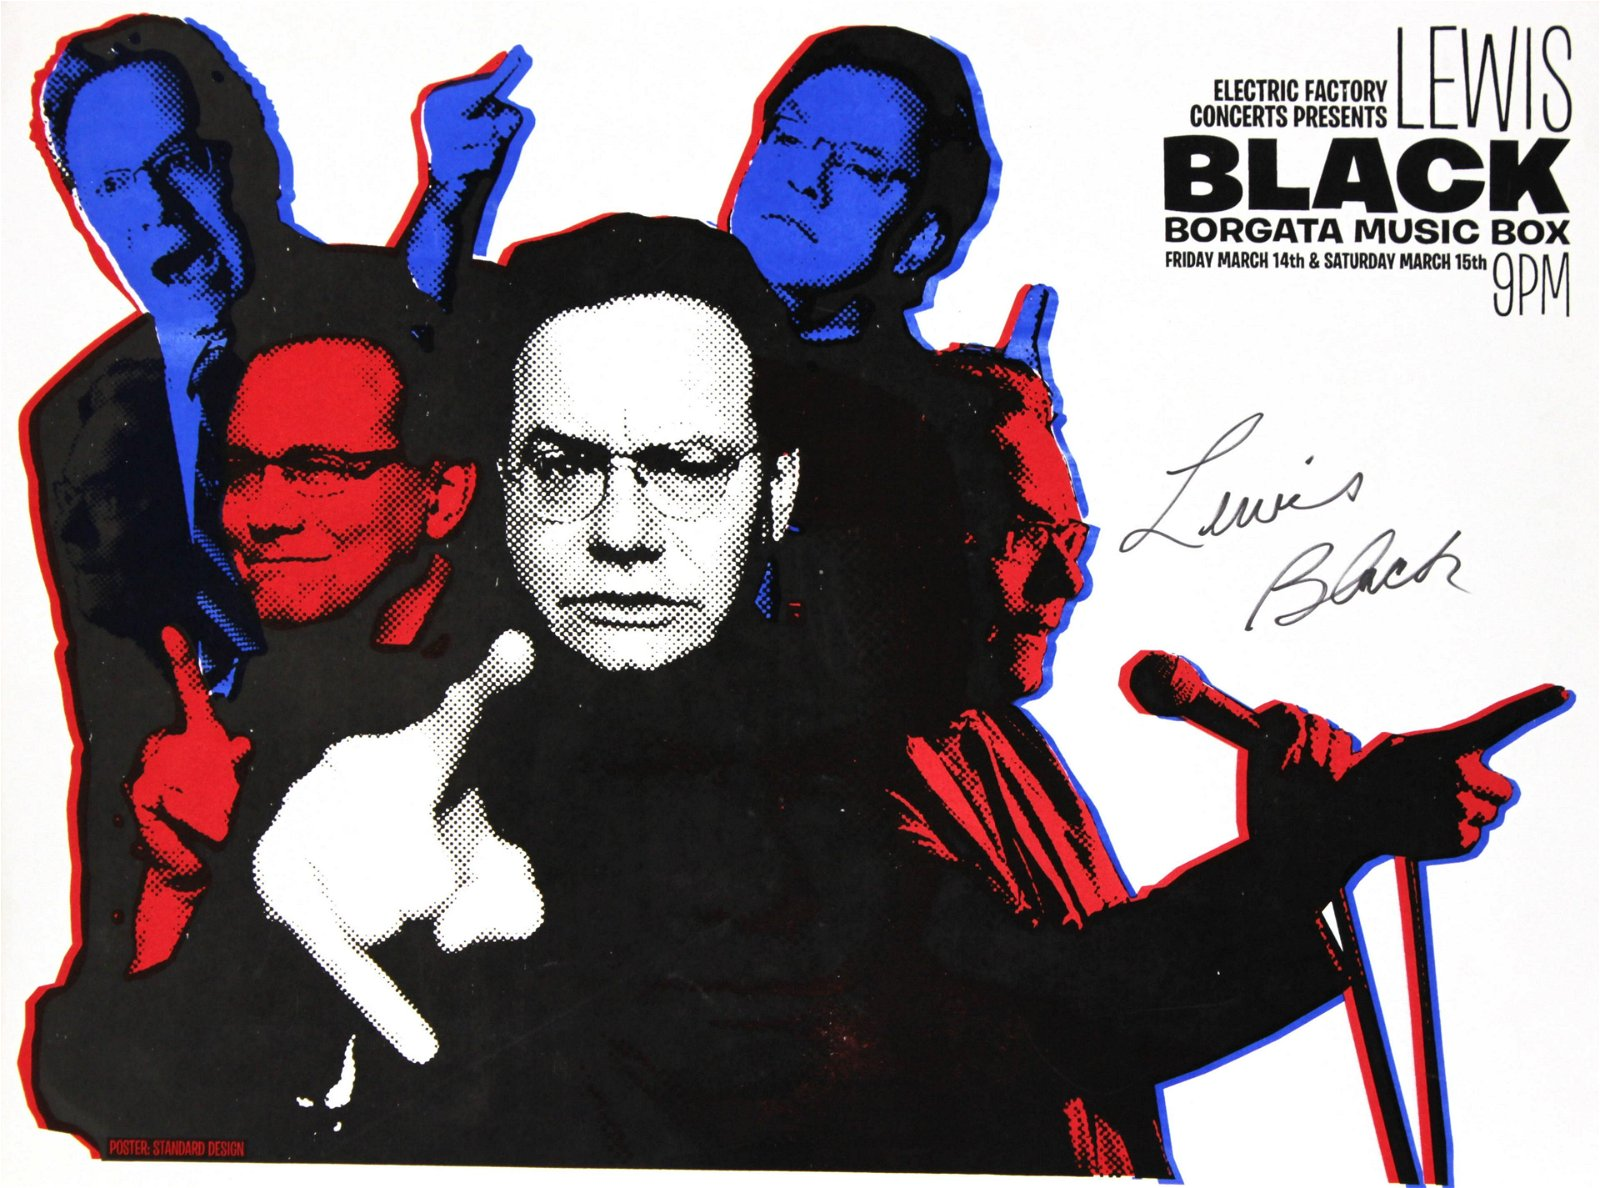 Lewis Black - Black Borgata Music Box Signed Poster